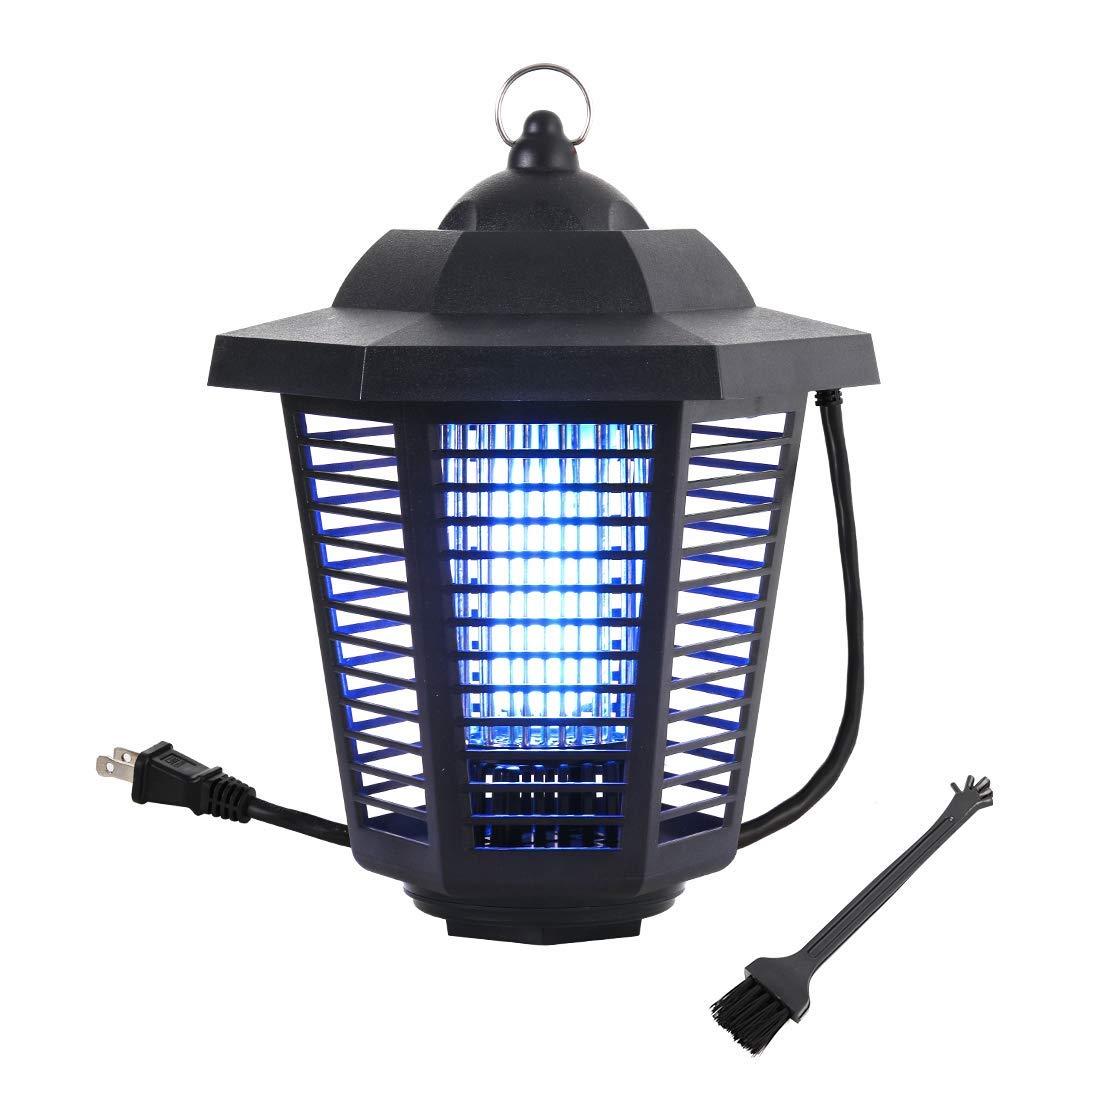 Garsum 1 Zapper,Powerful Electric Bee Trap-20 Watts, Covers 1-1/2, Black by Garsum